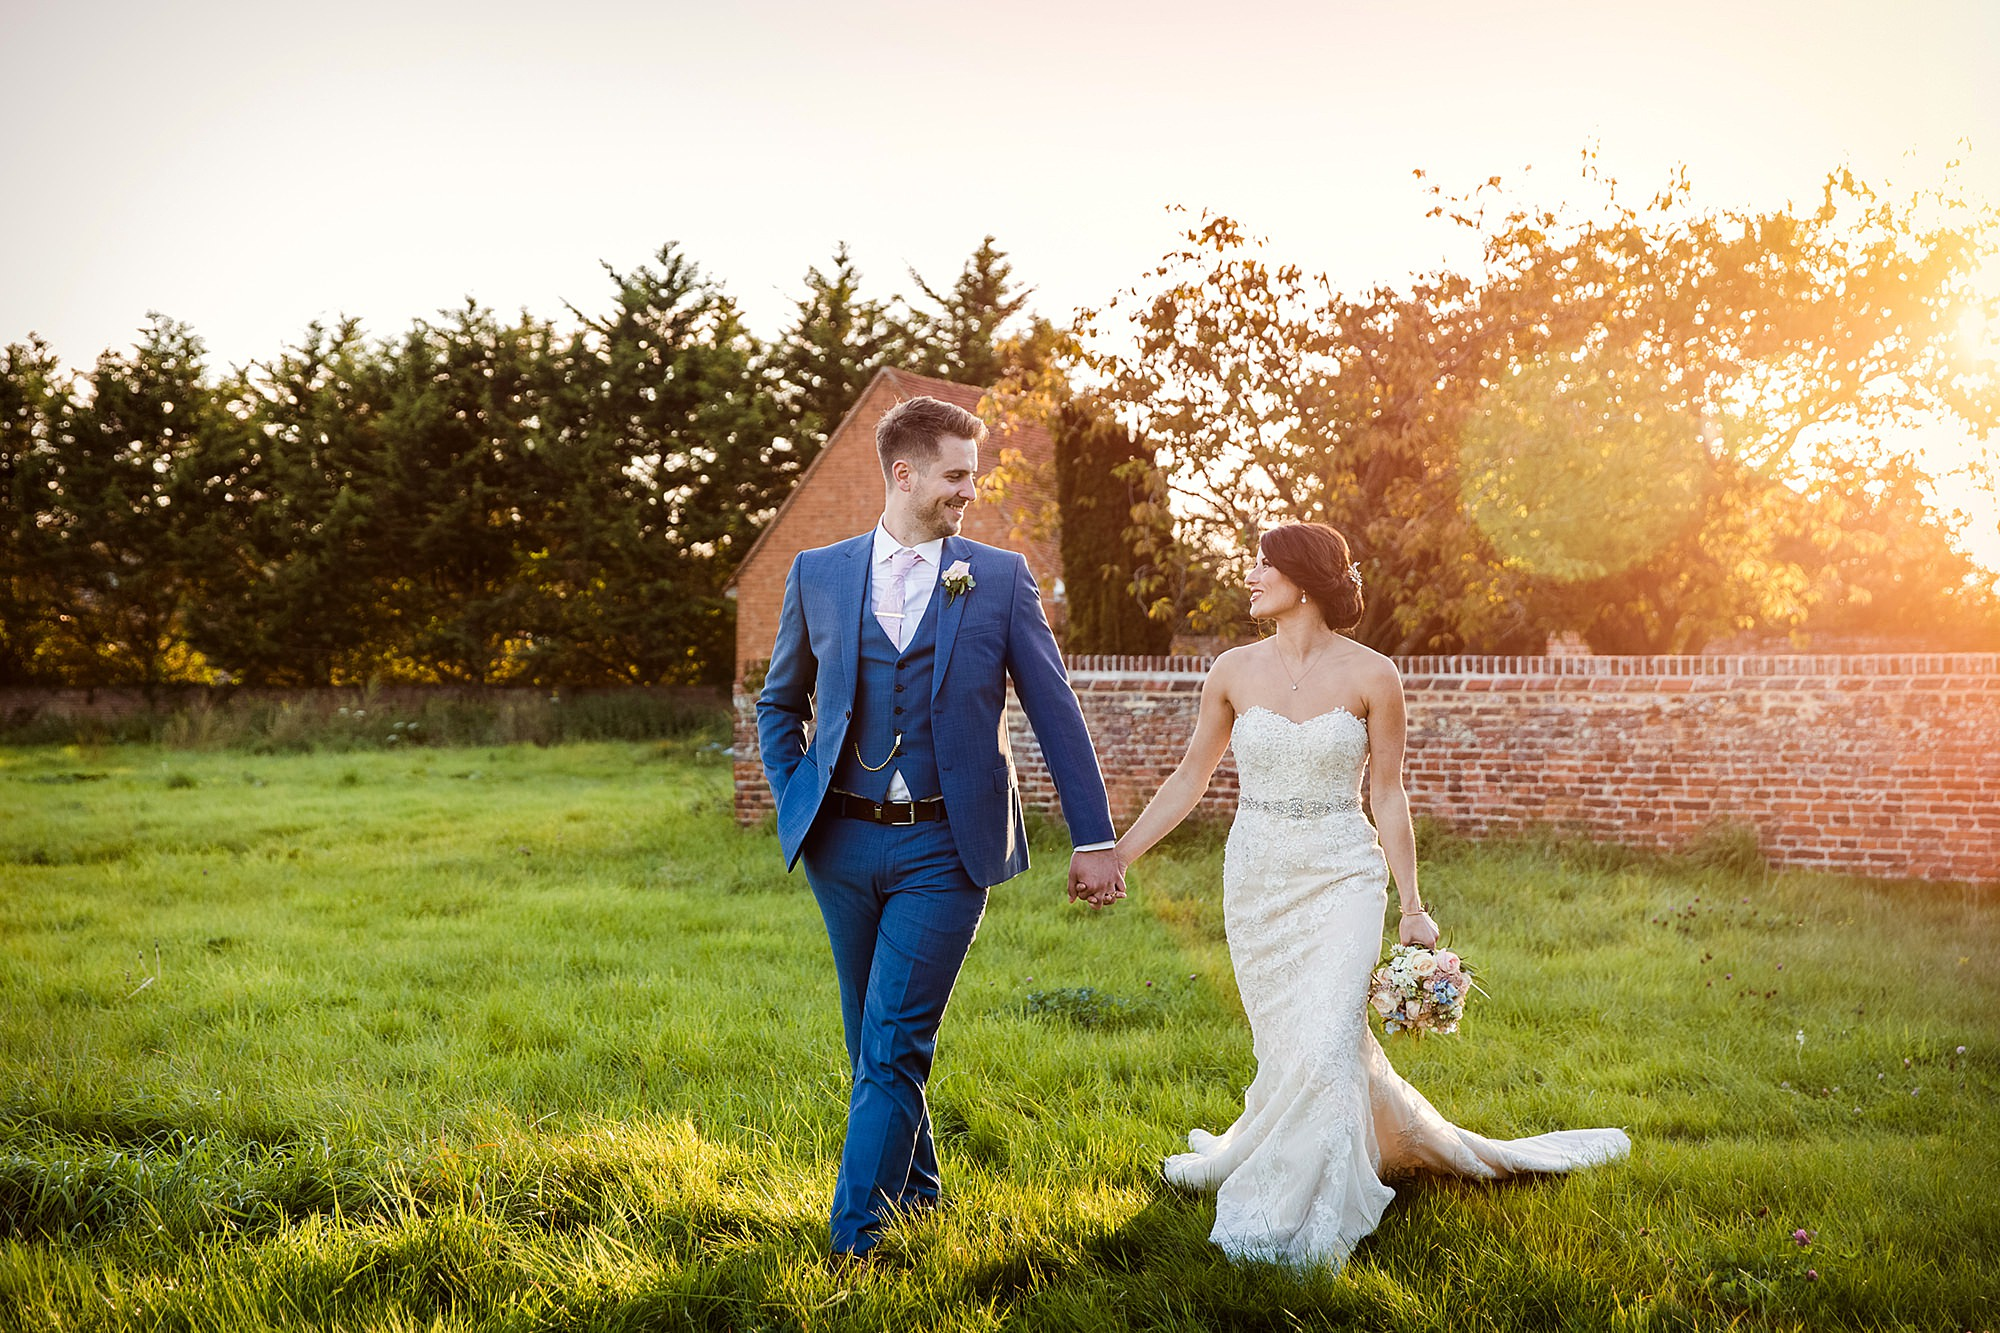 Lillibrooke Manor wedding bride and groom walking at sunset